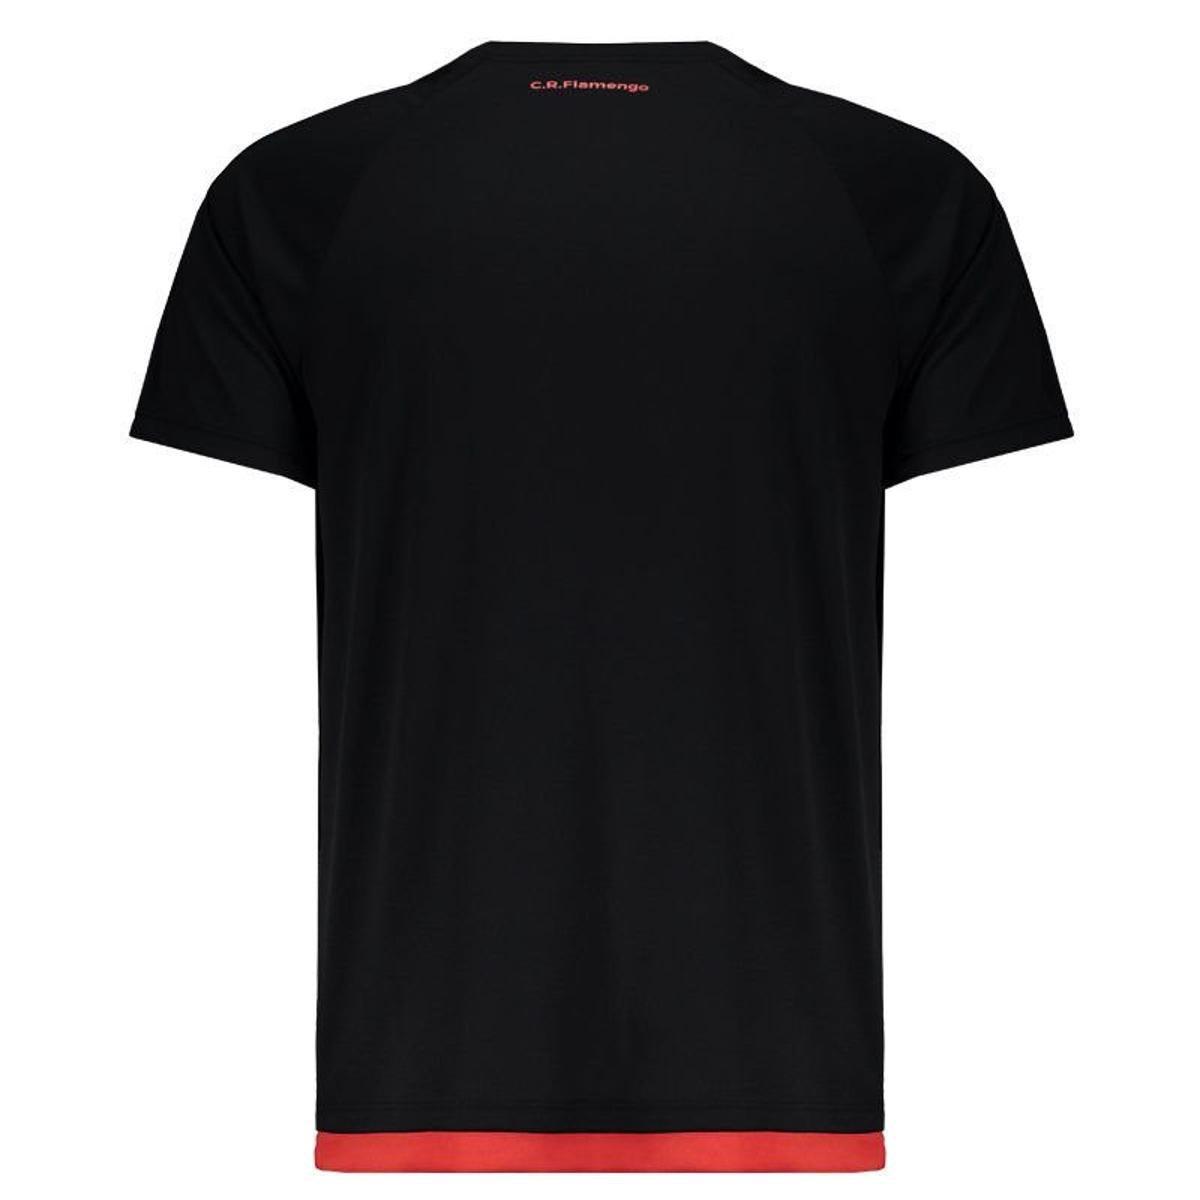 Camisa Flamengo Rally Masculina - Preto - Compre Agora  66d4253779a52